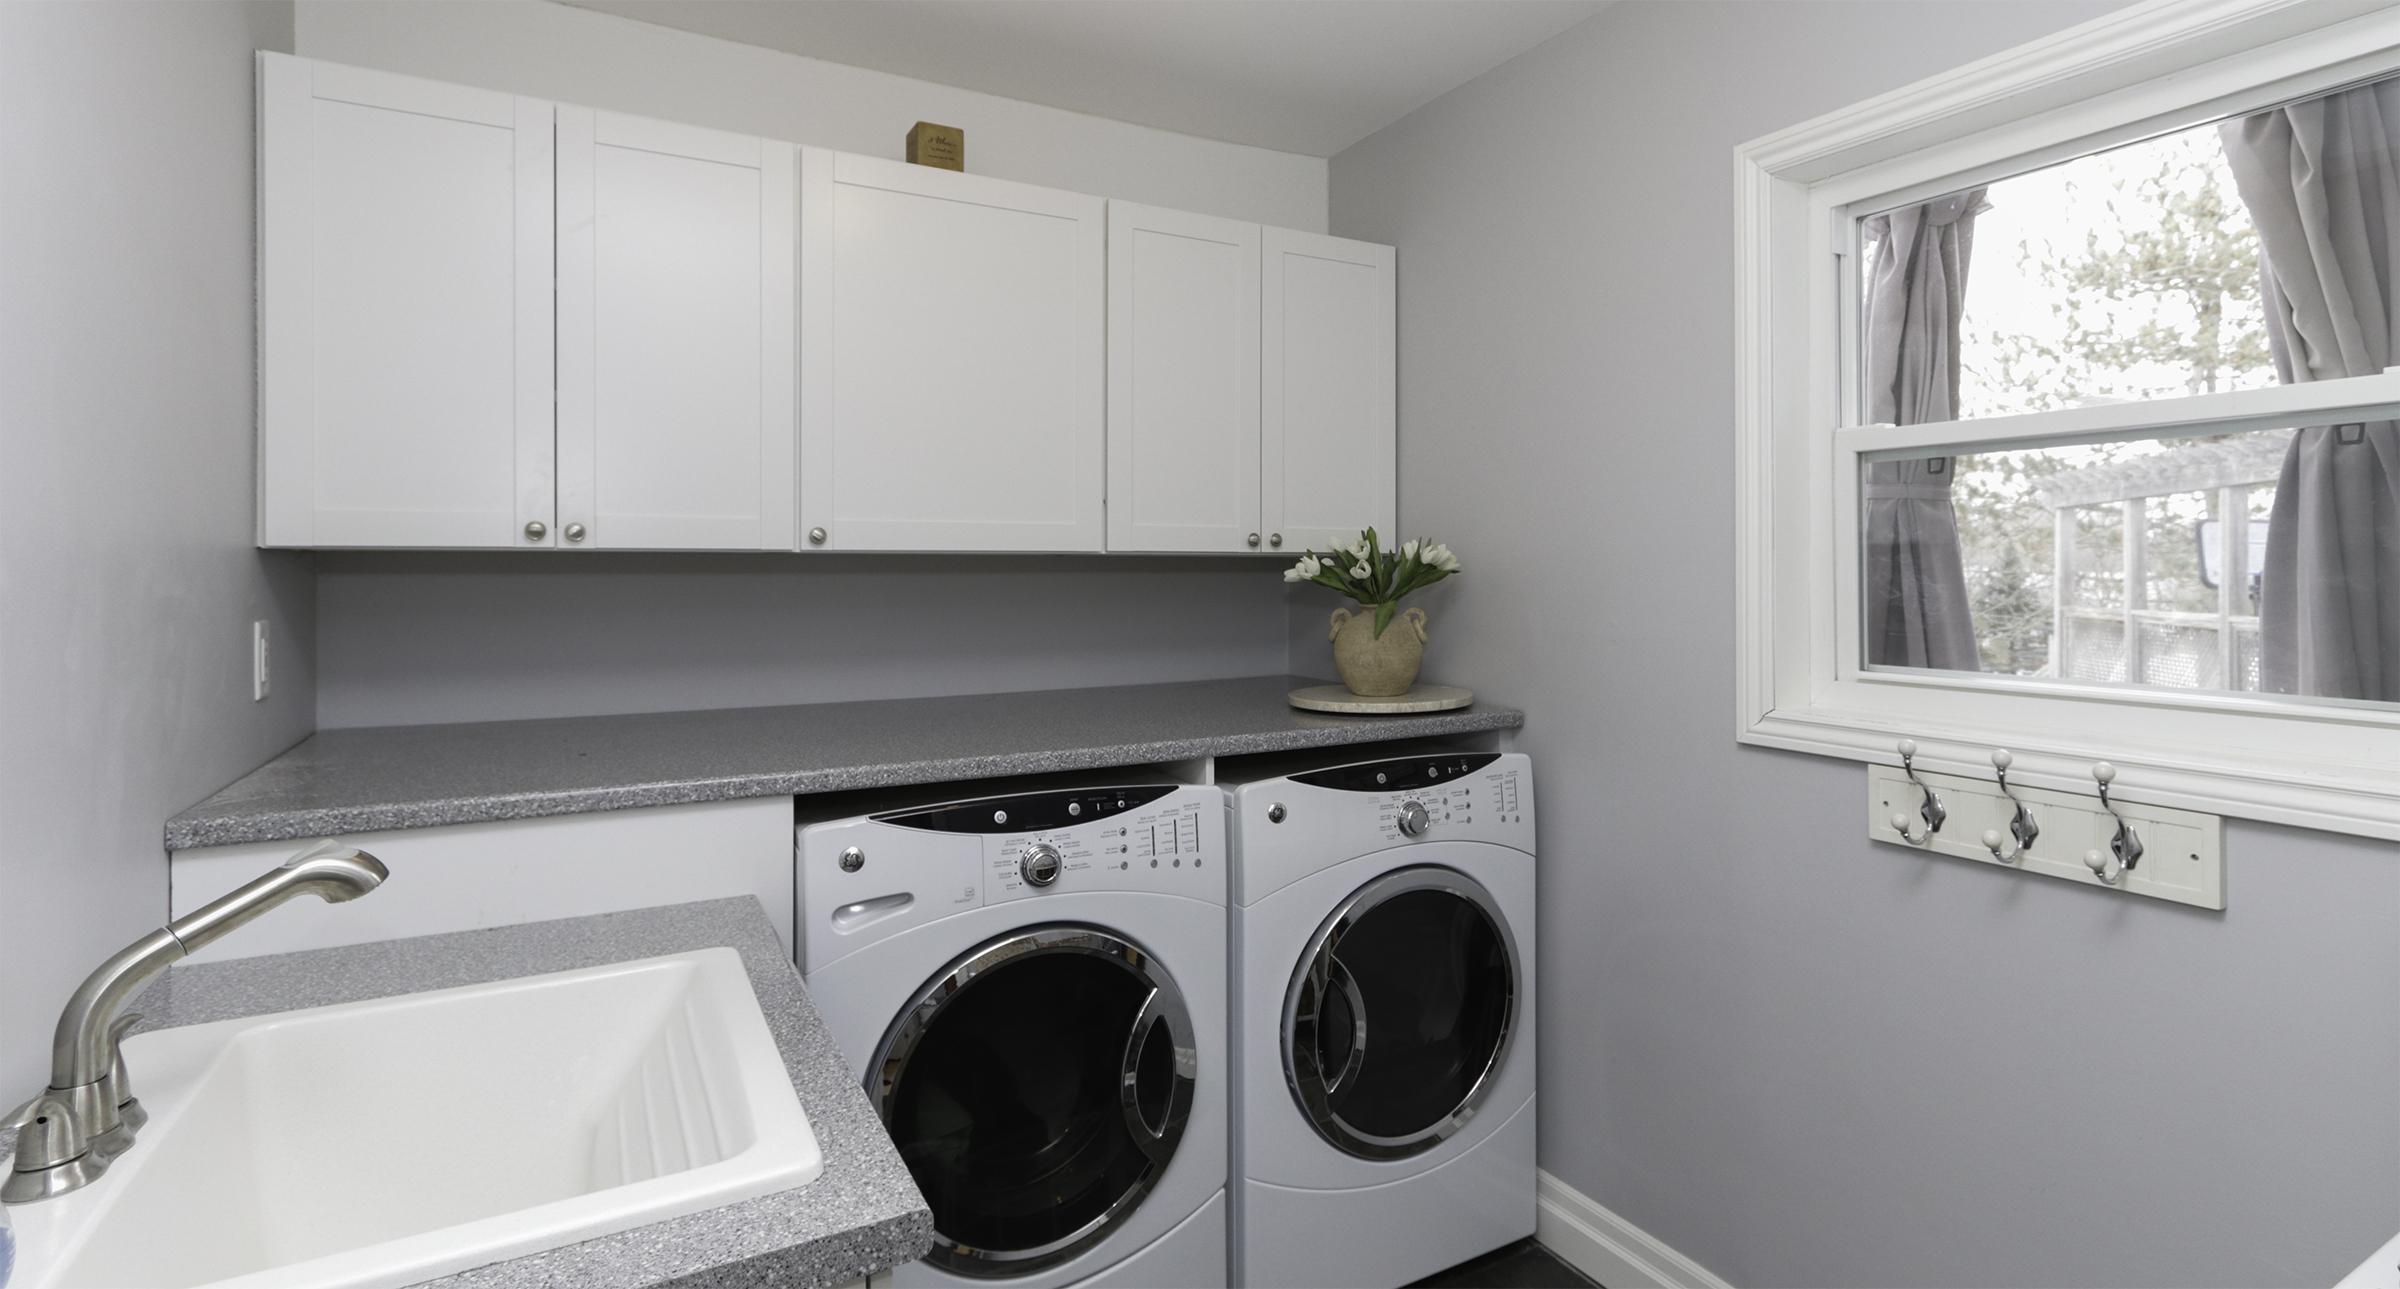 MTBS - 9170 Ashburn Laundry Renovation